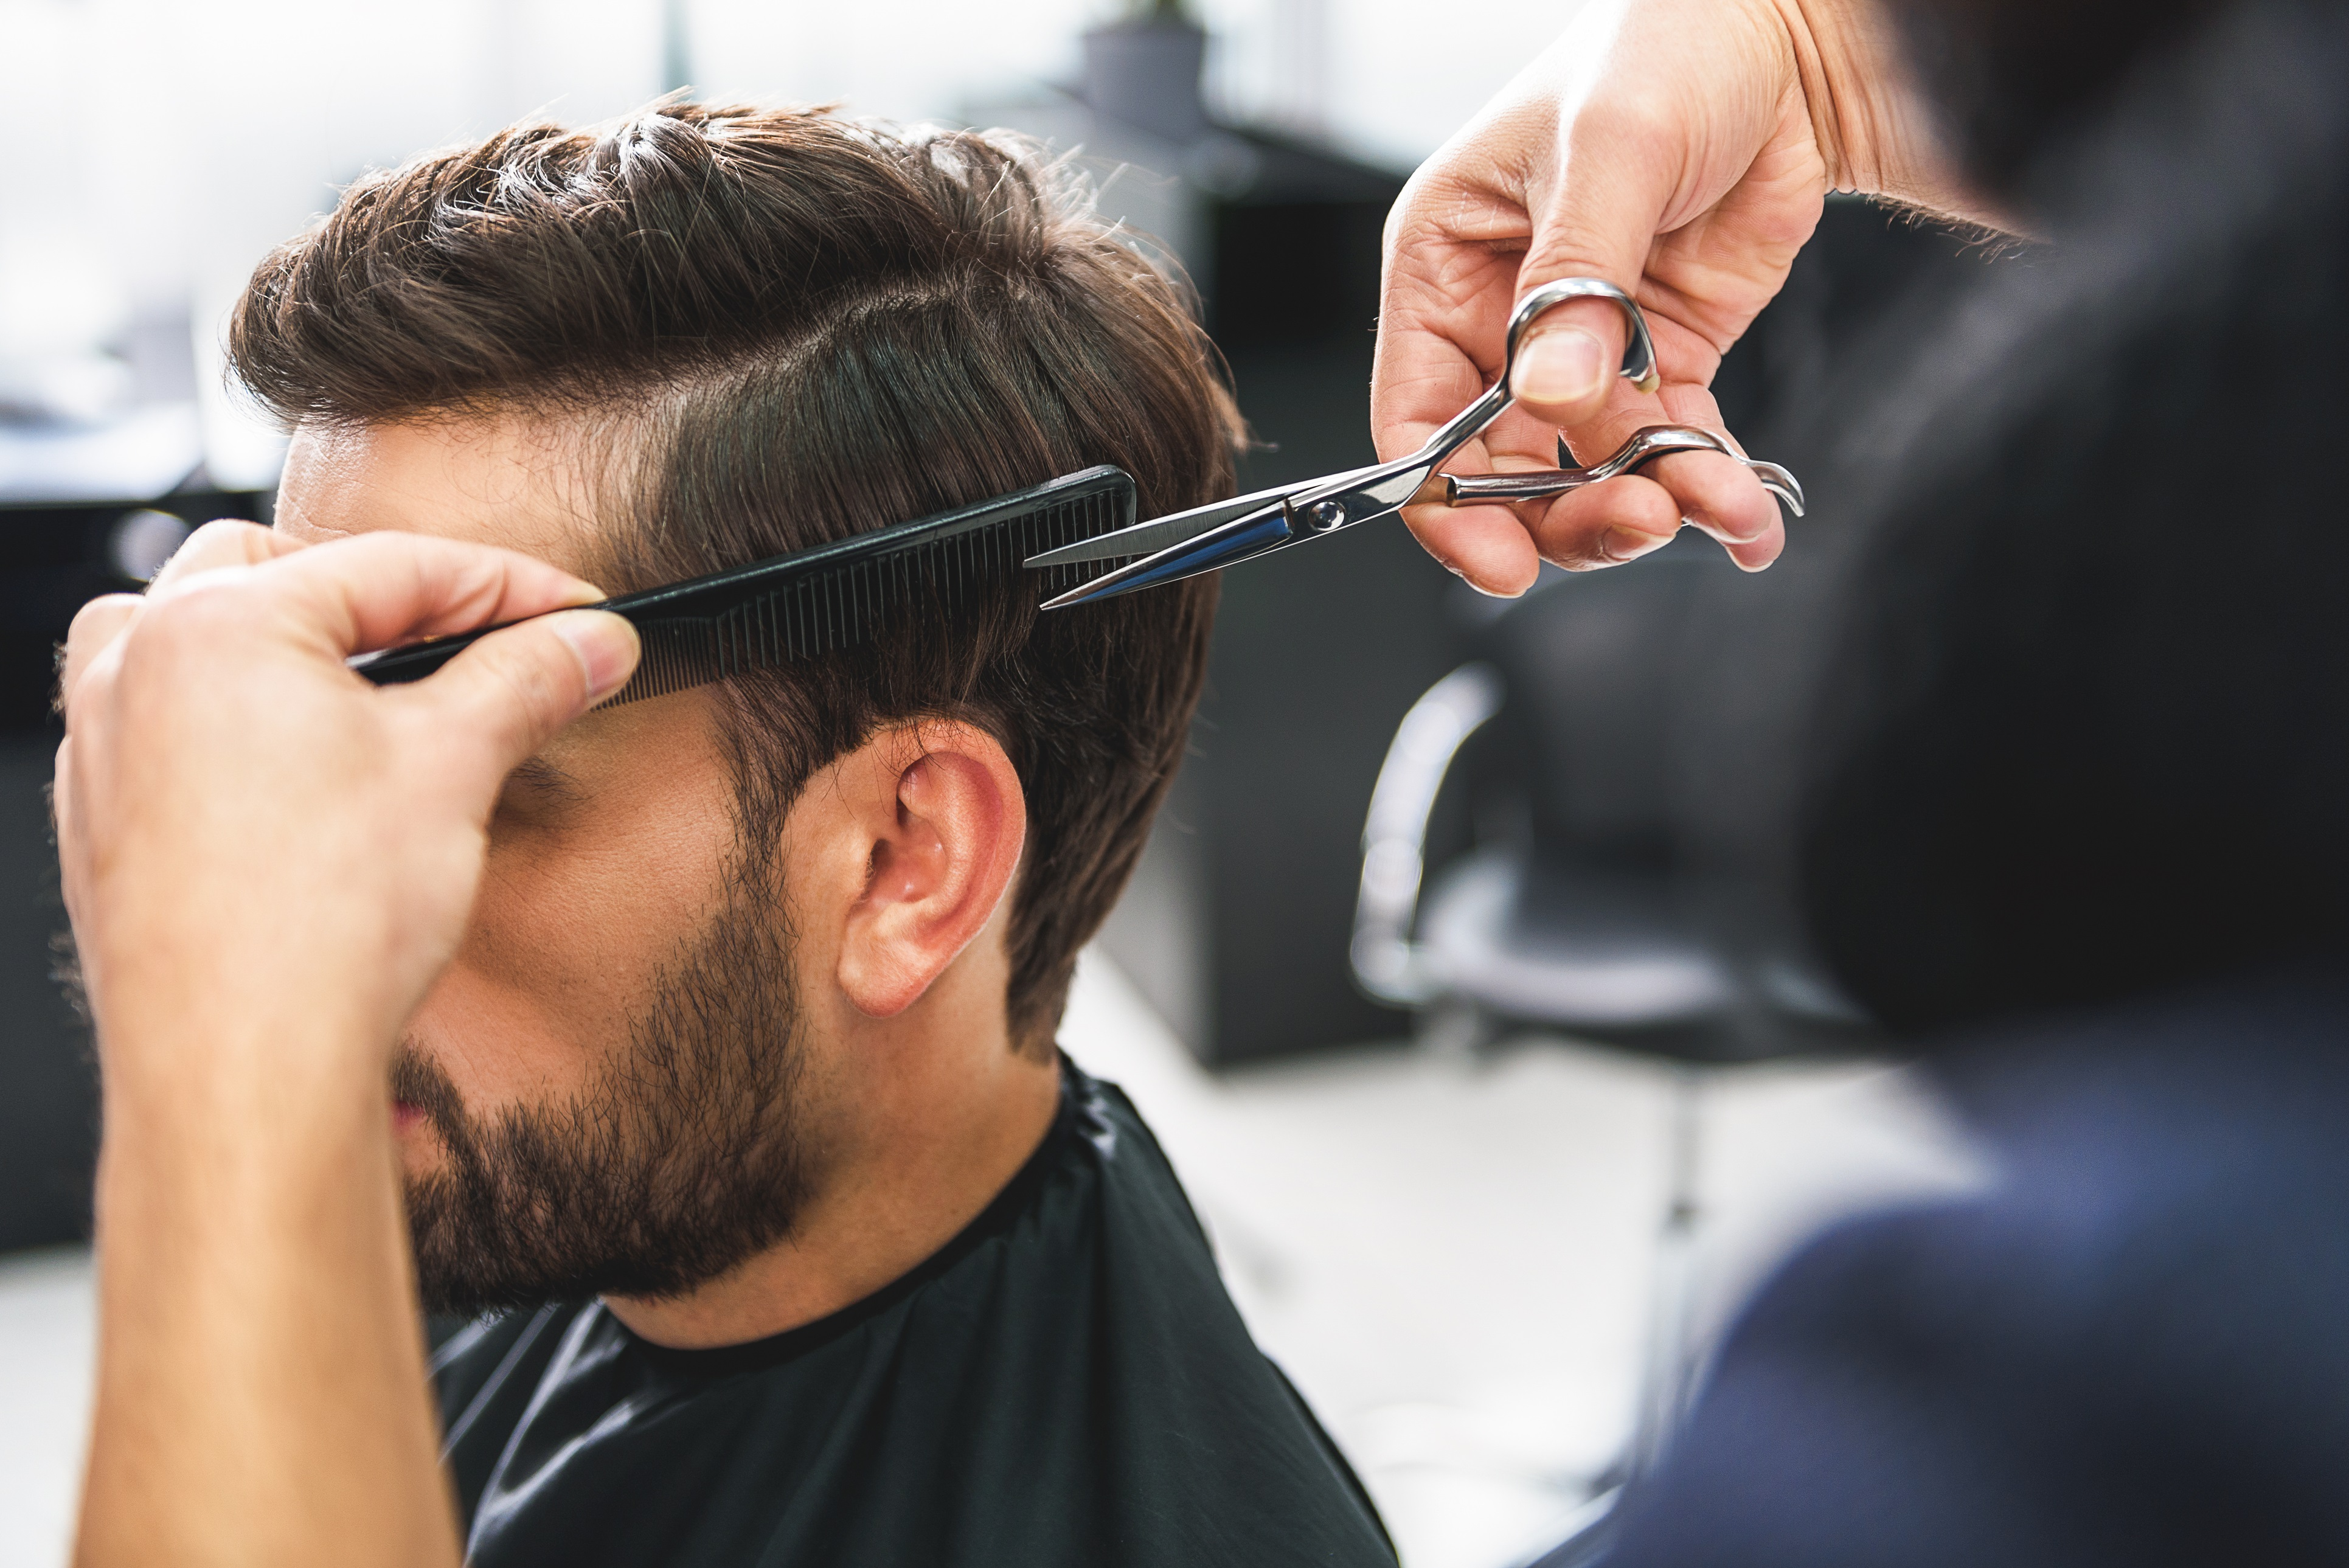 hair testing collector cuts - HD3862×2578